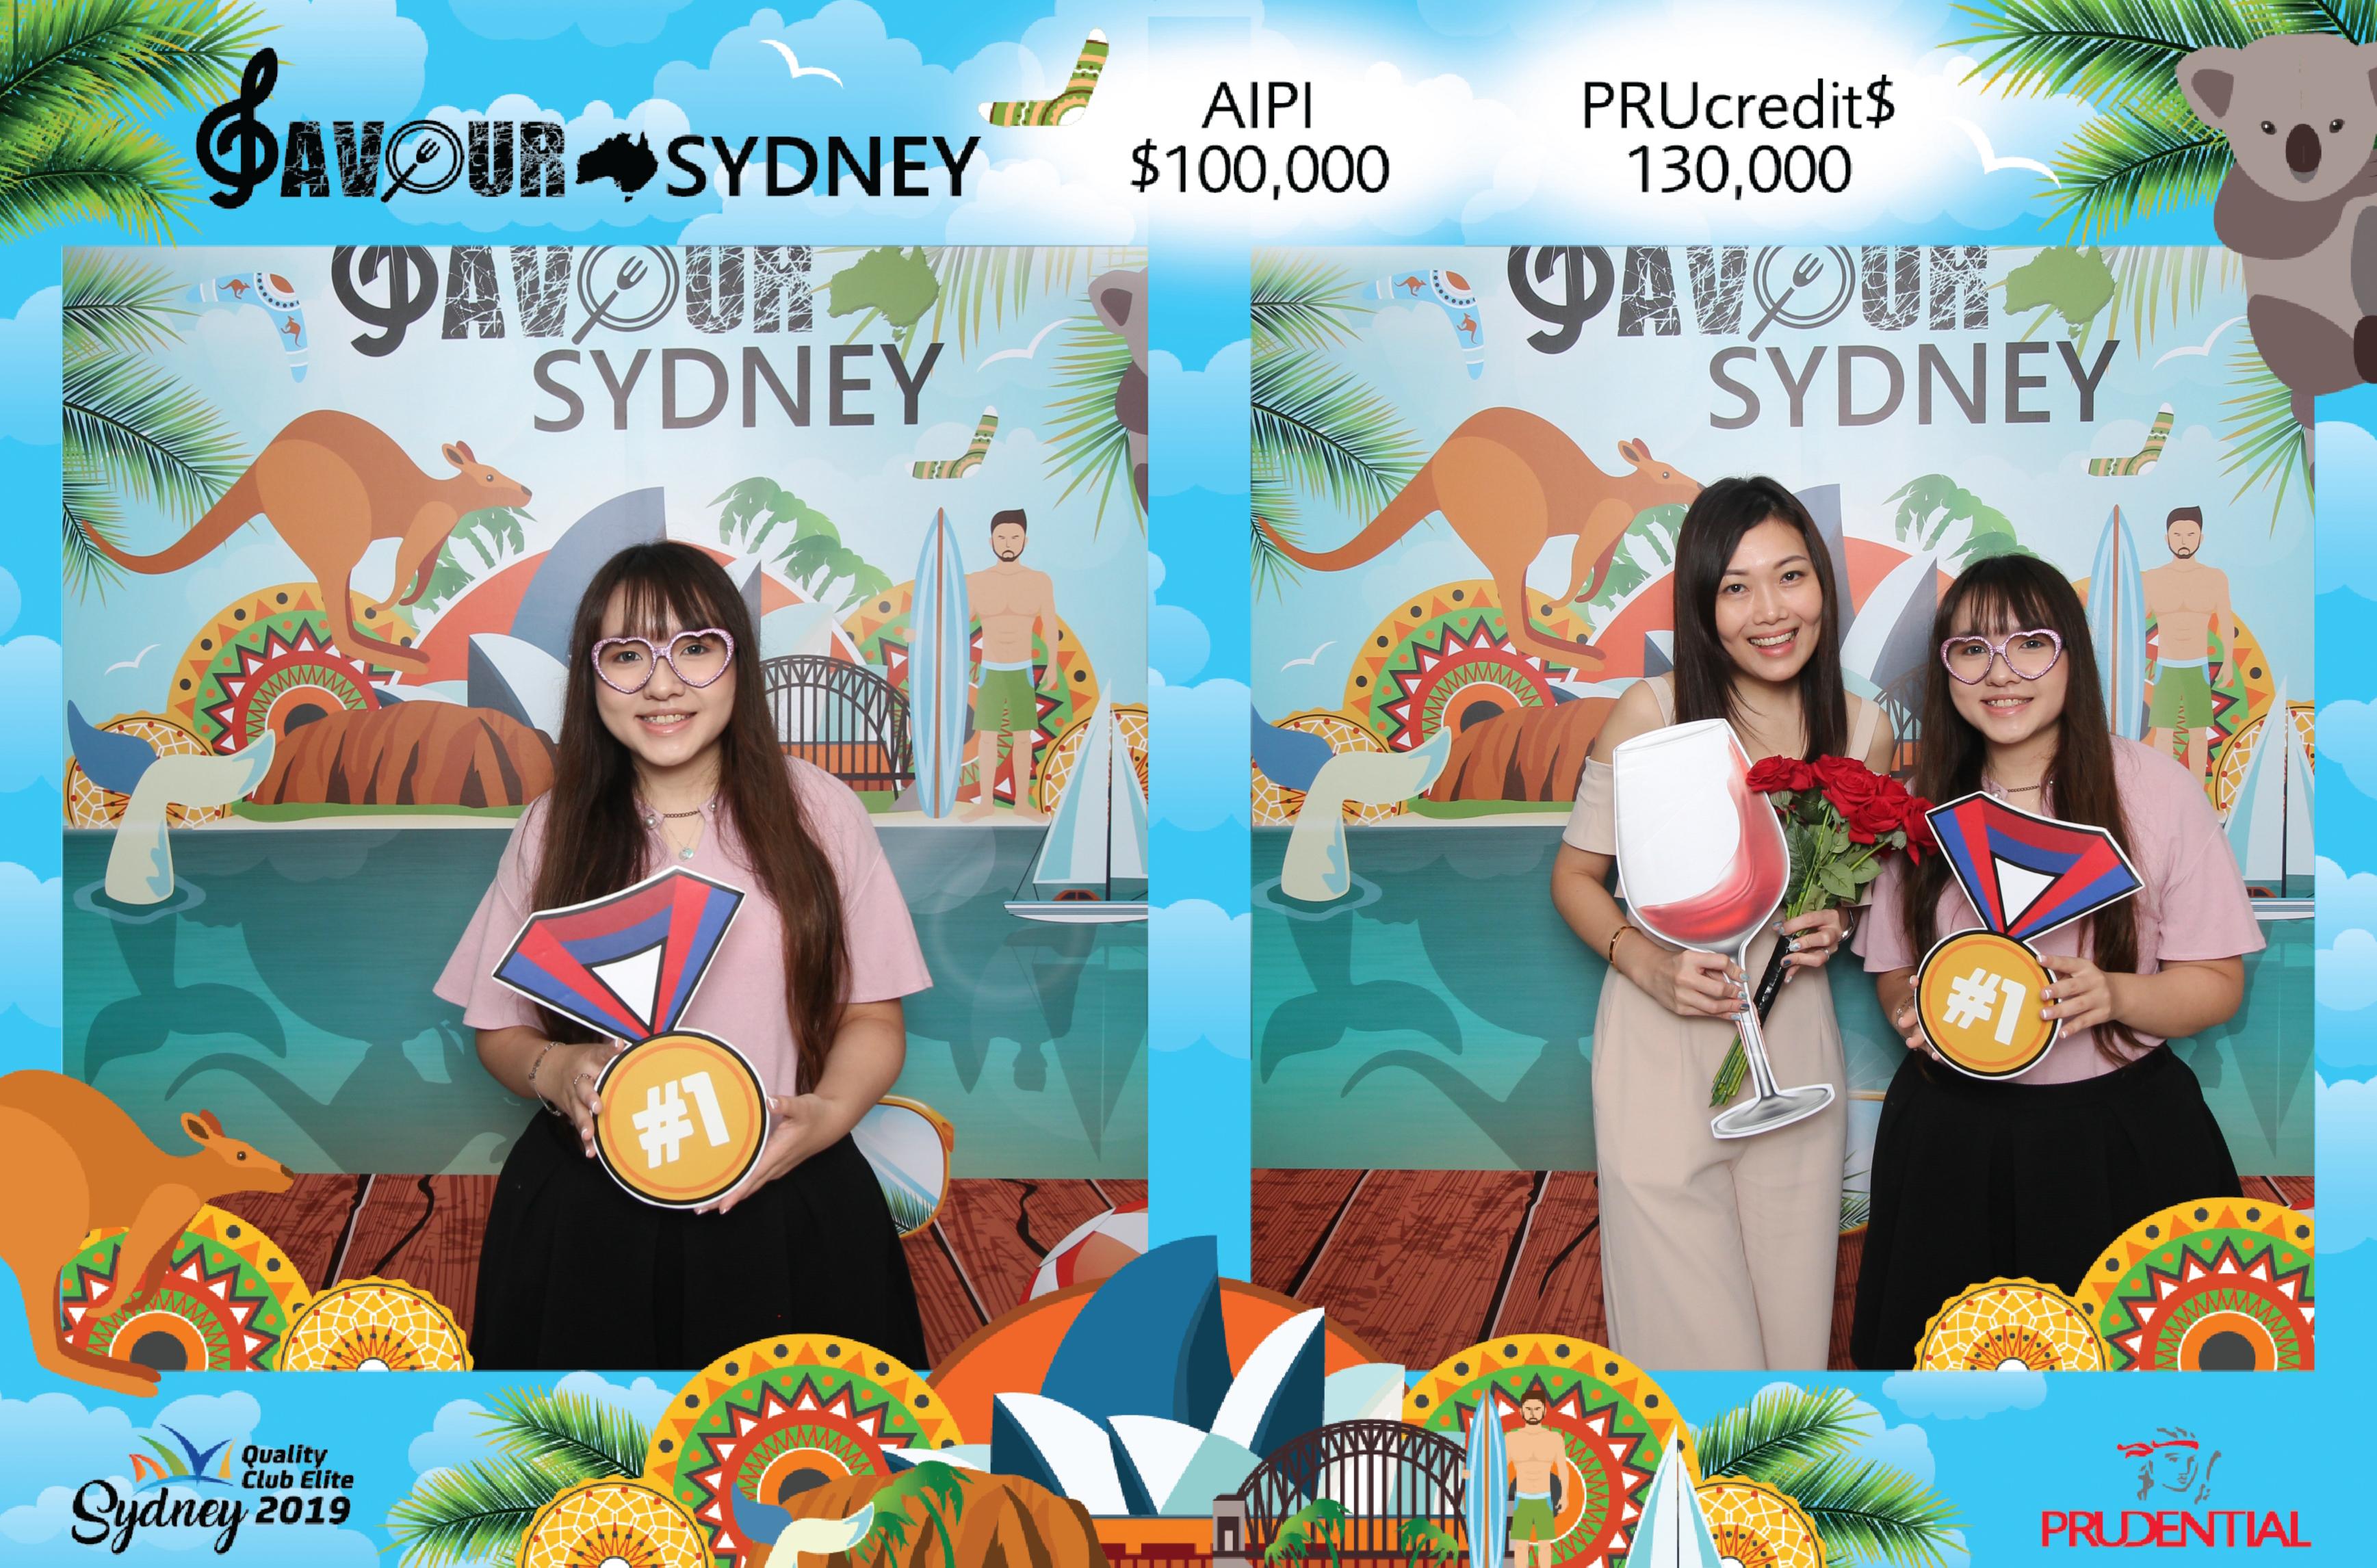 photo booth singapore (58)